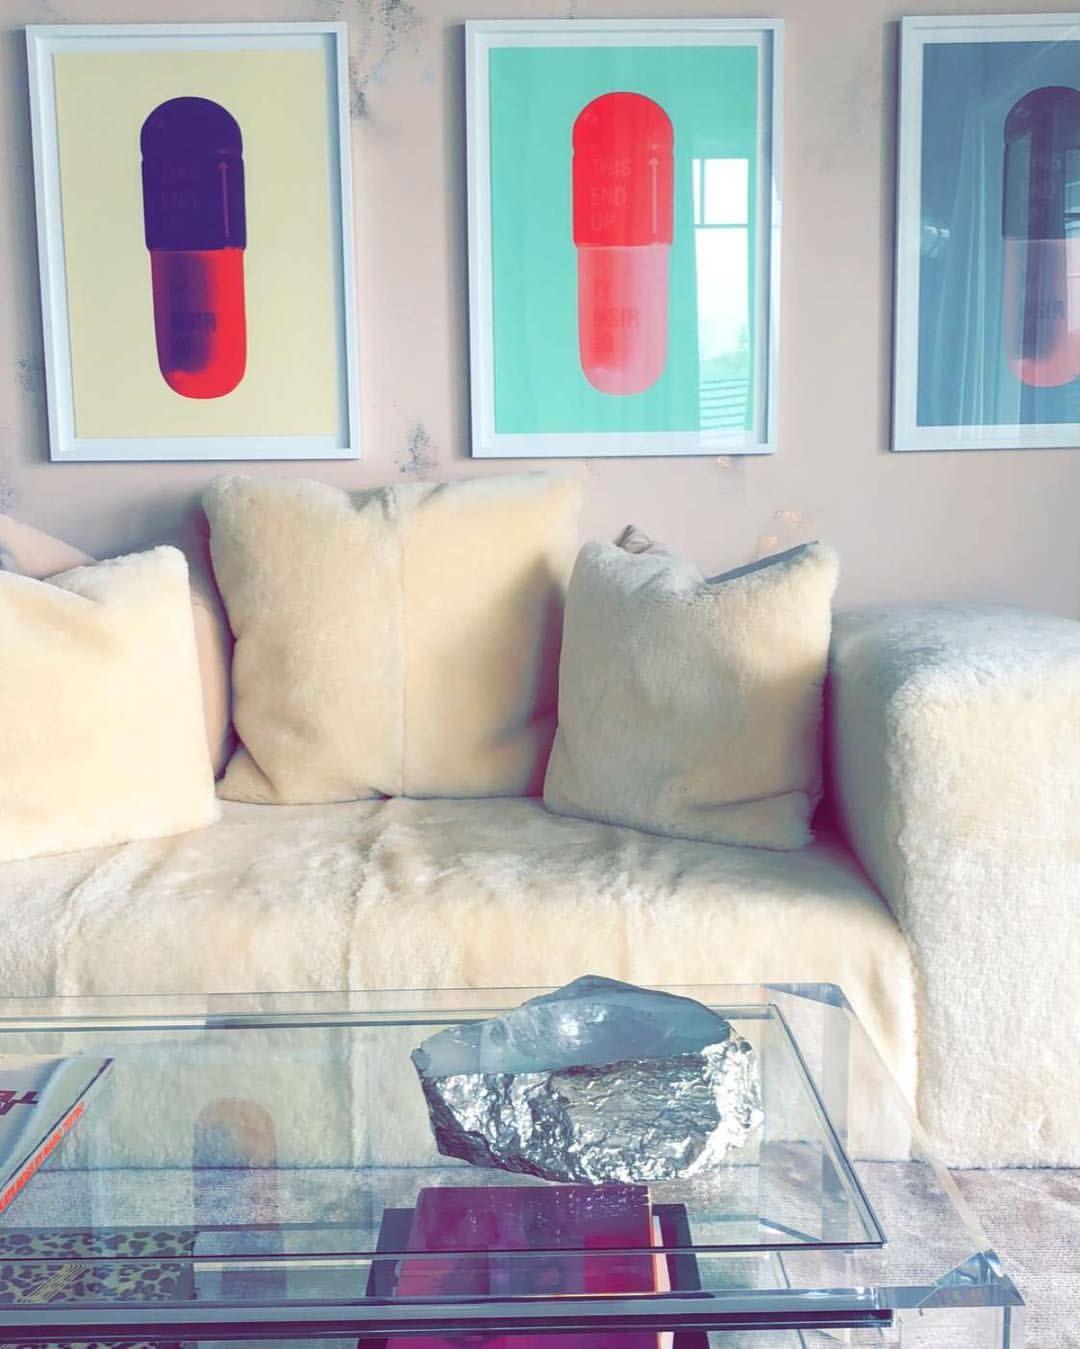 Kylie S Master Bedroom Sitting Area Via Snapchat Kyliejennerhouse Interior Design Kylie Jenner House Master Bedroom Sitting Area Bedroom With Sitting Area